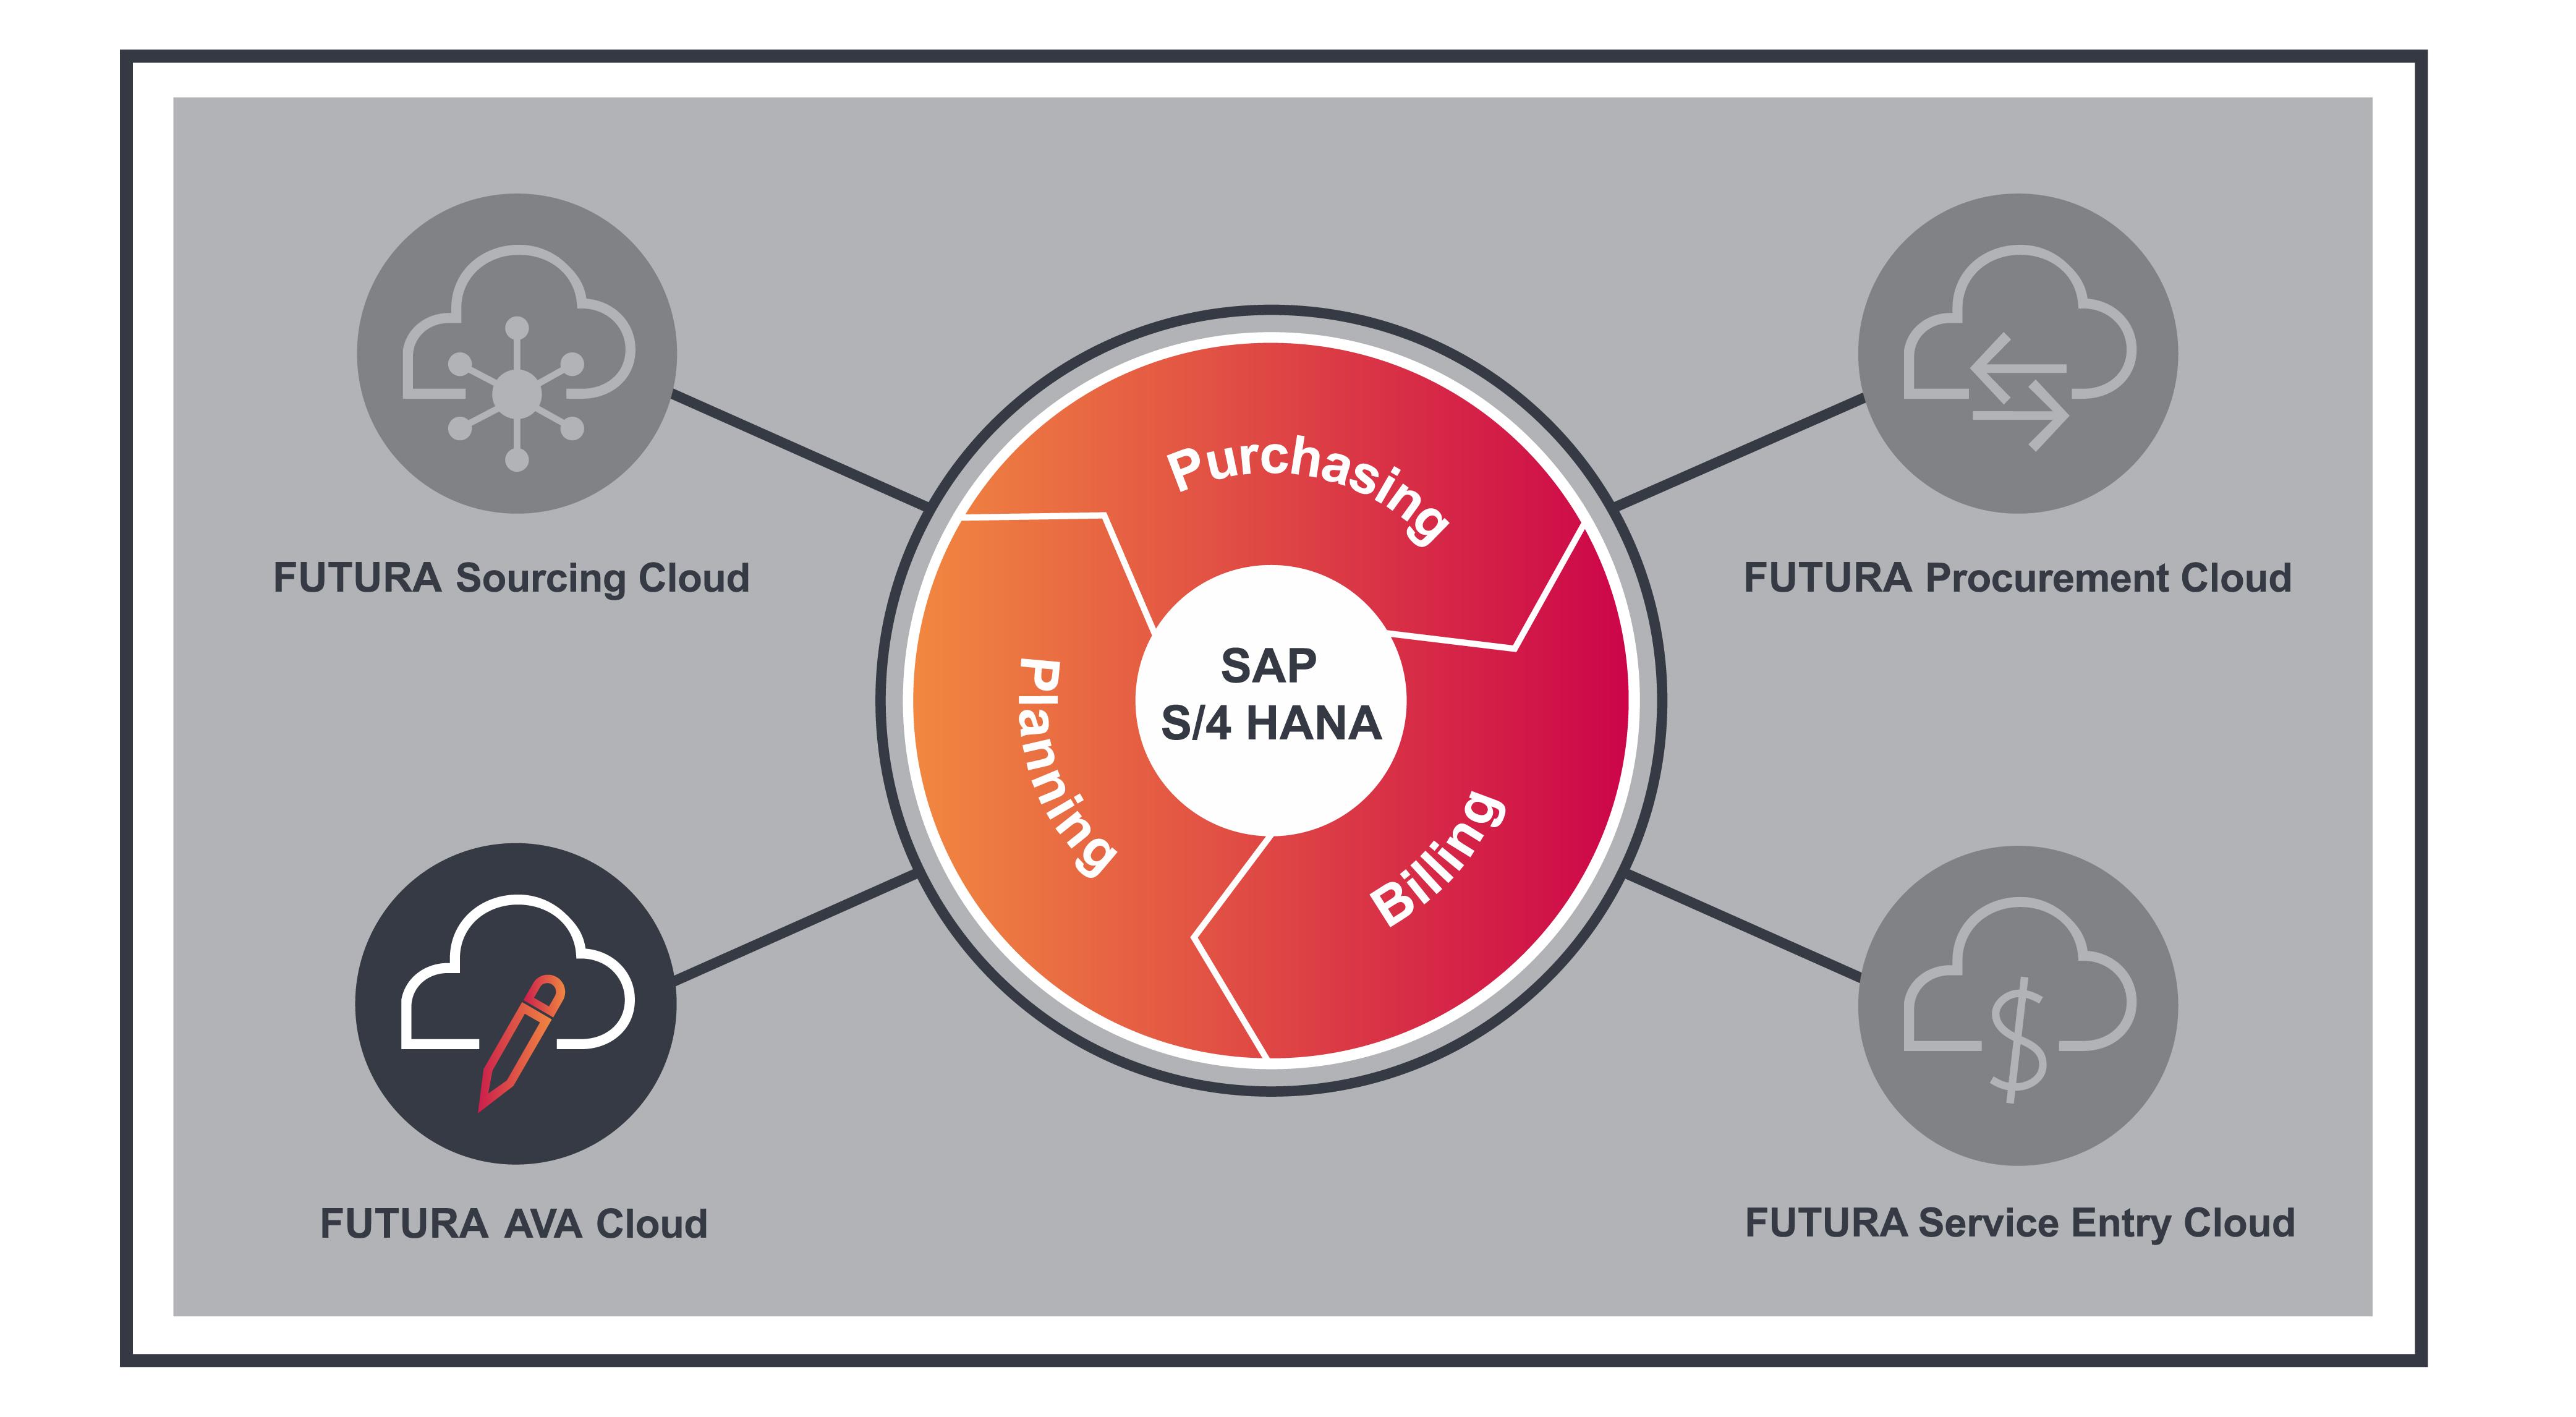 FUTURA Service Entry cloud